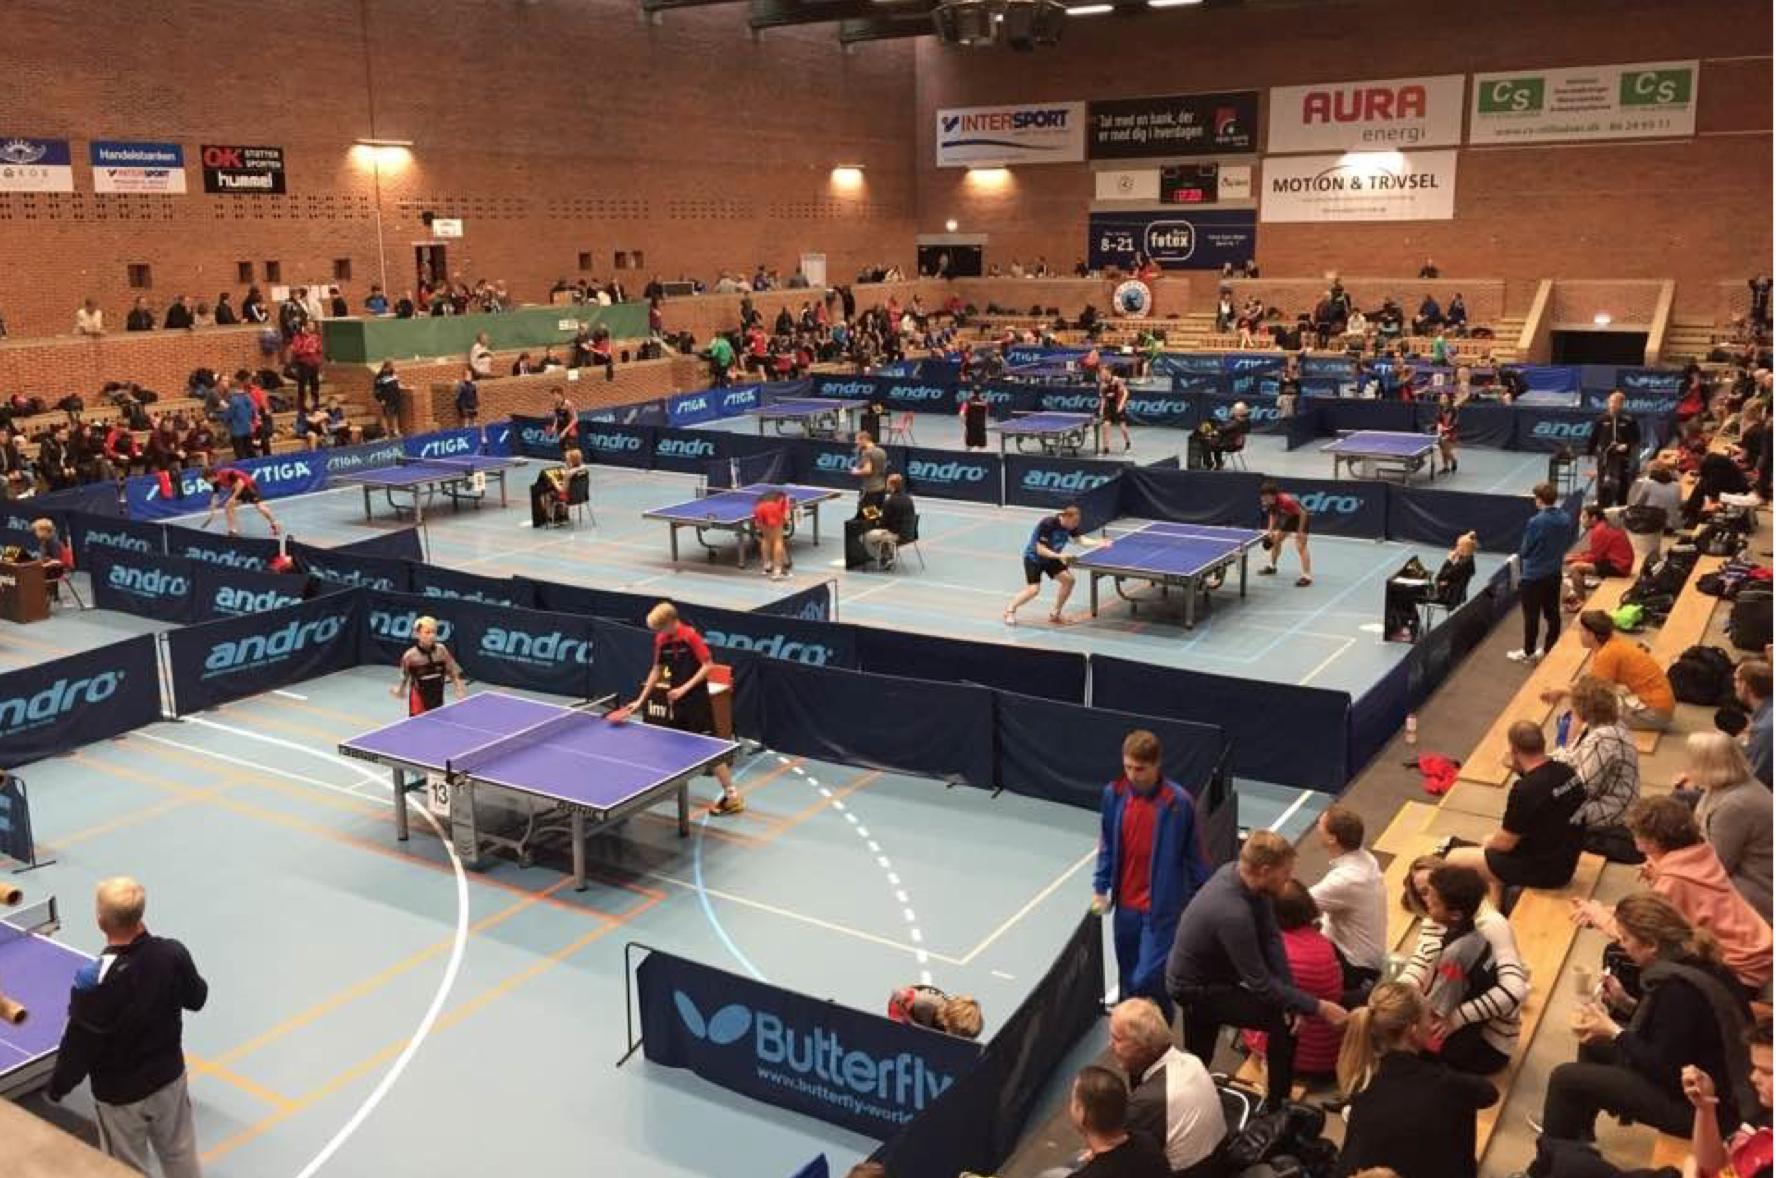 Aarhus Open Bordtennis 2019